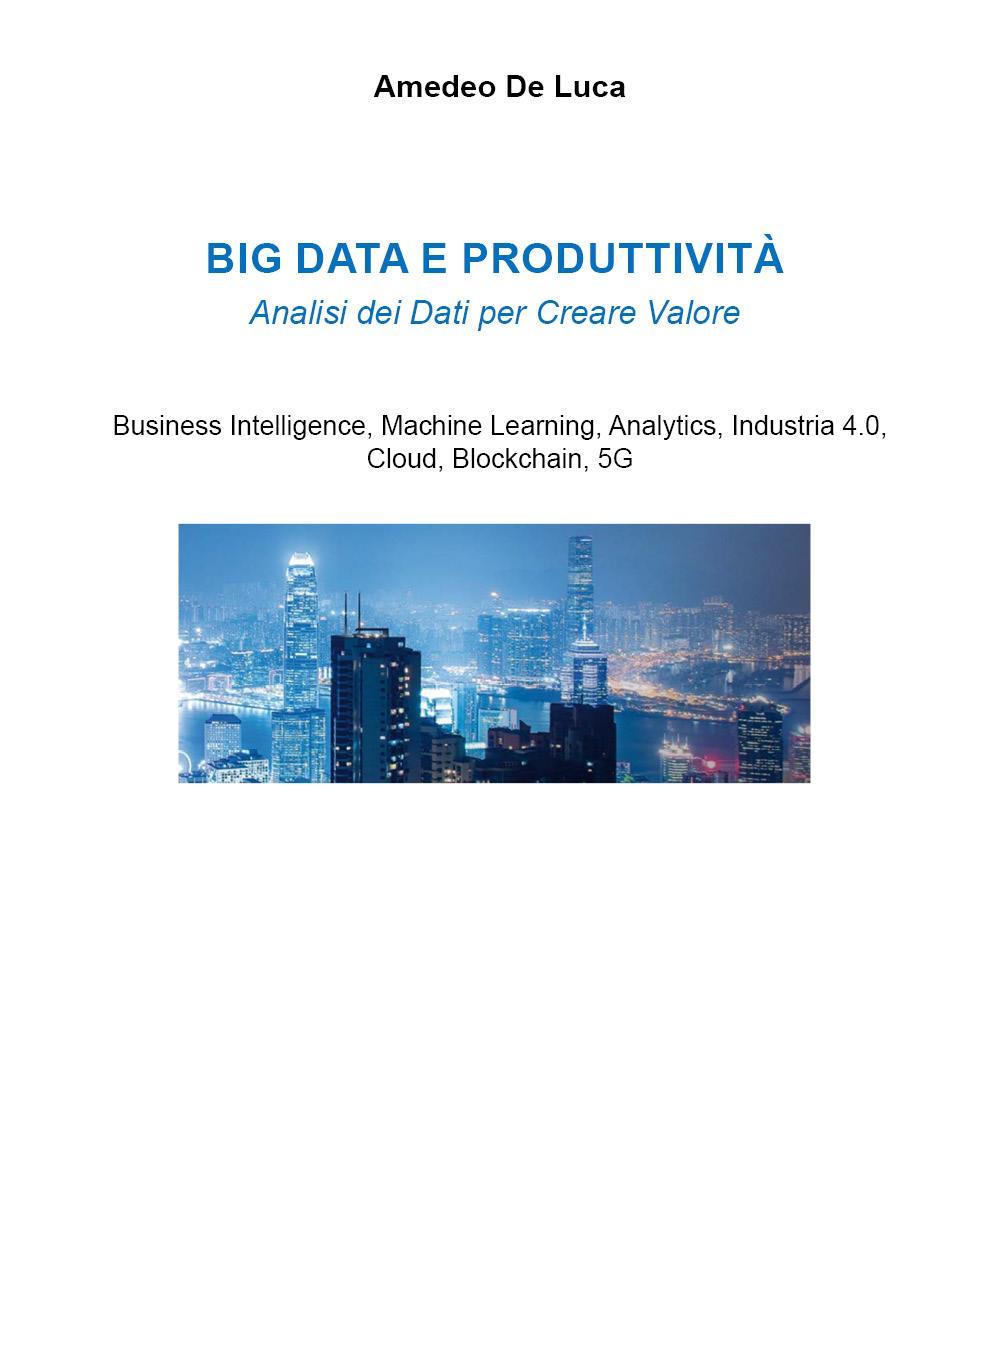 Big Data e Produttività